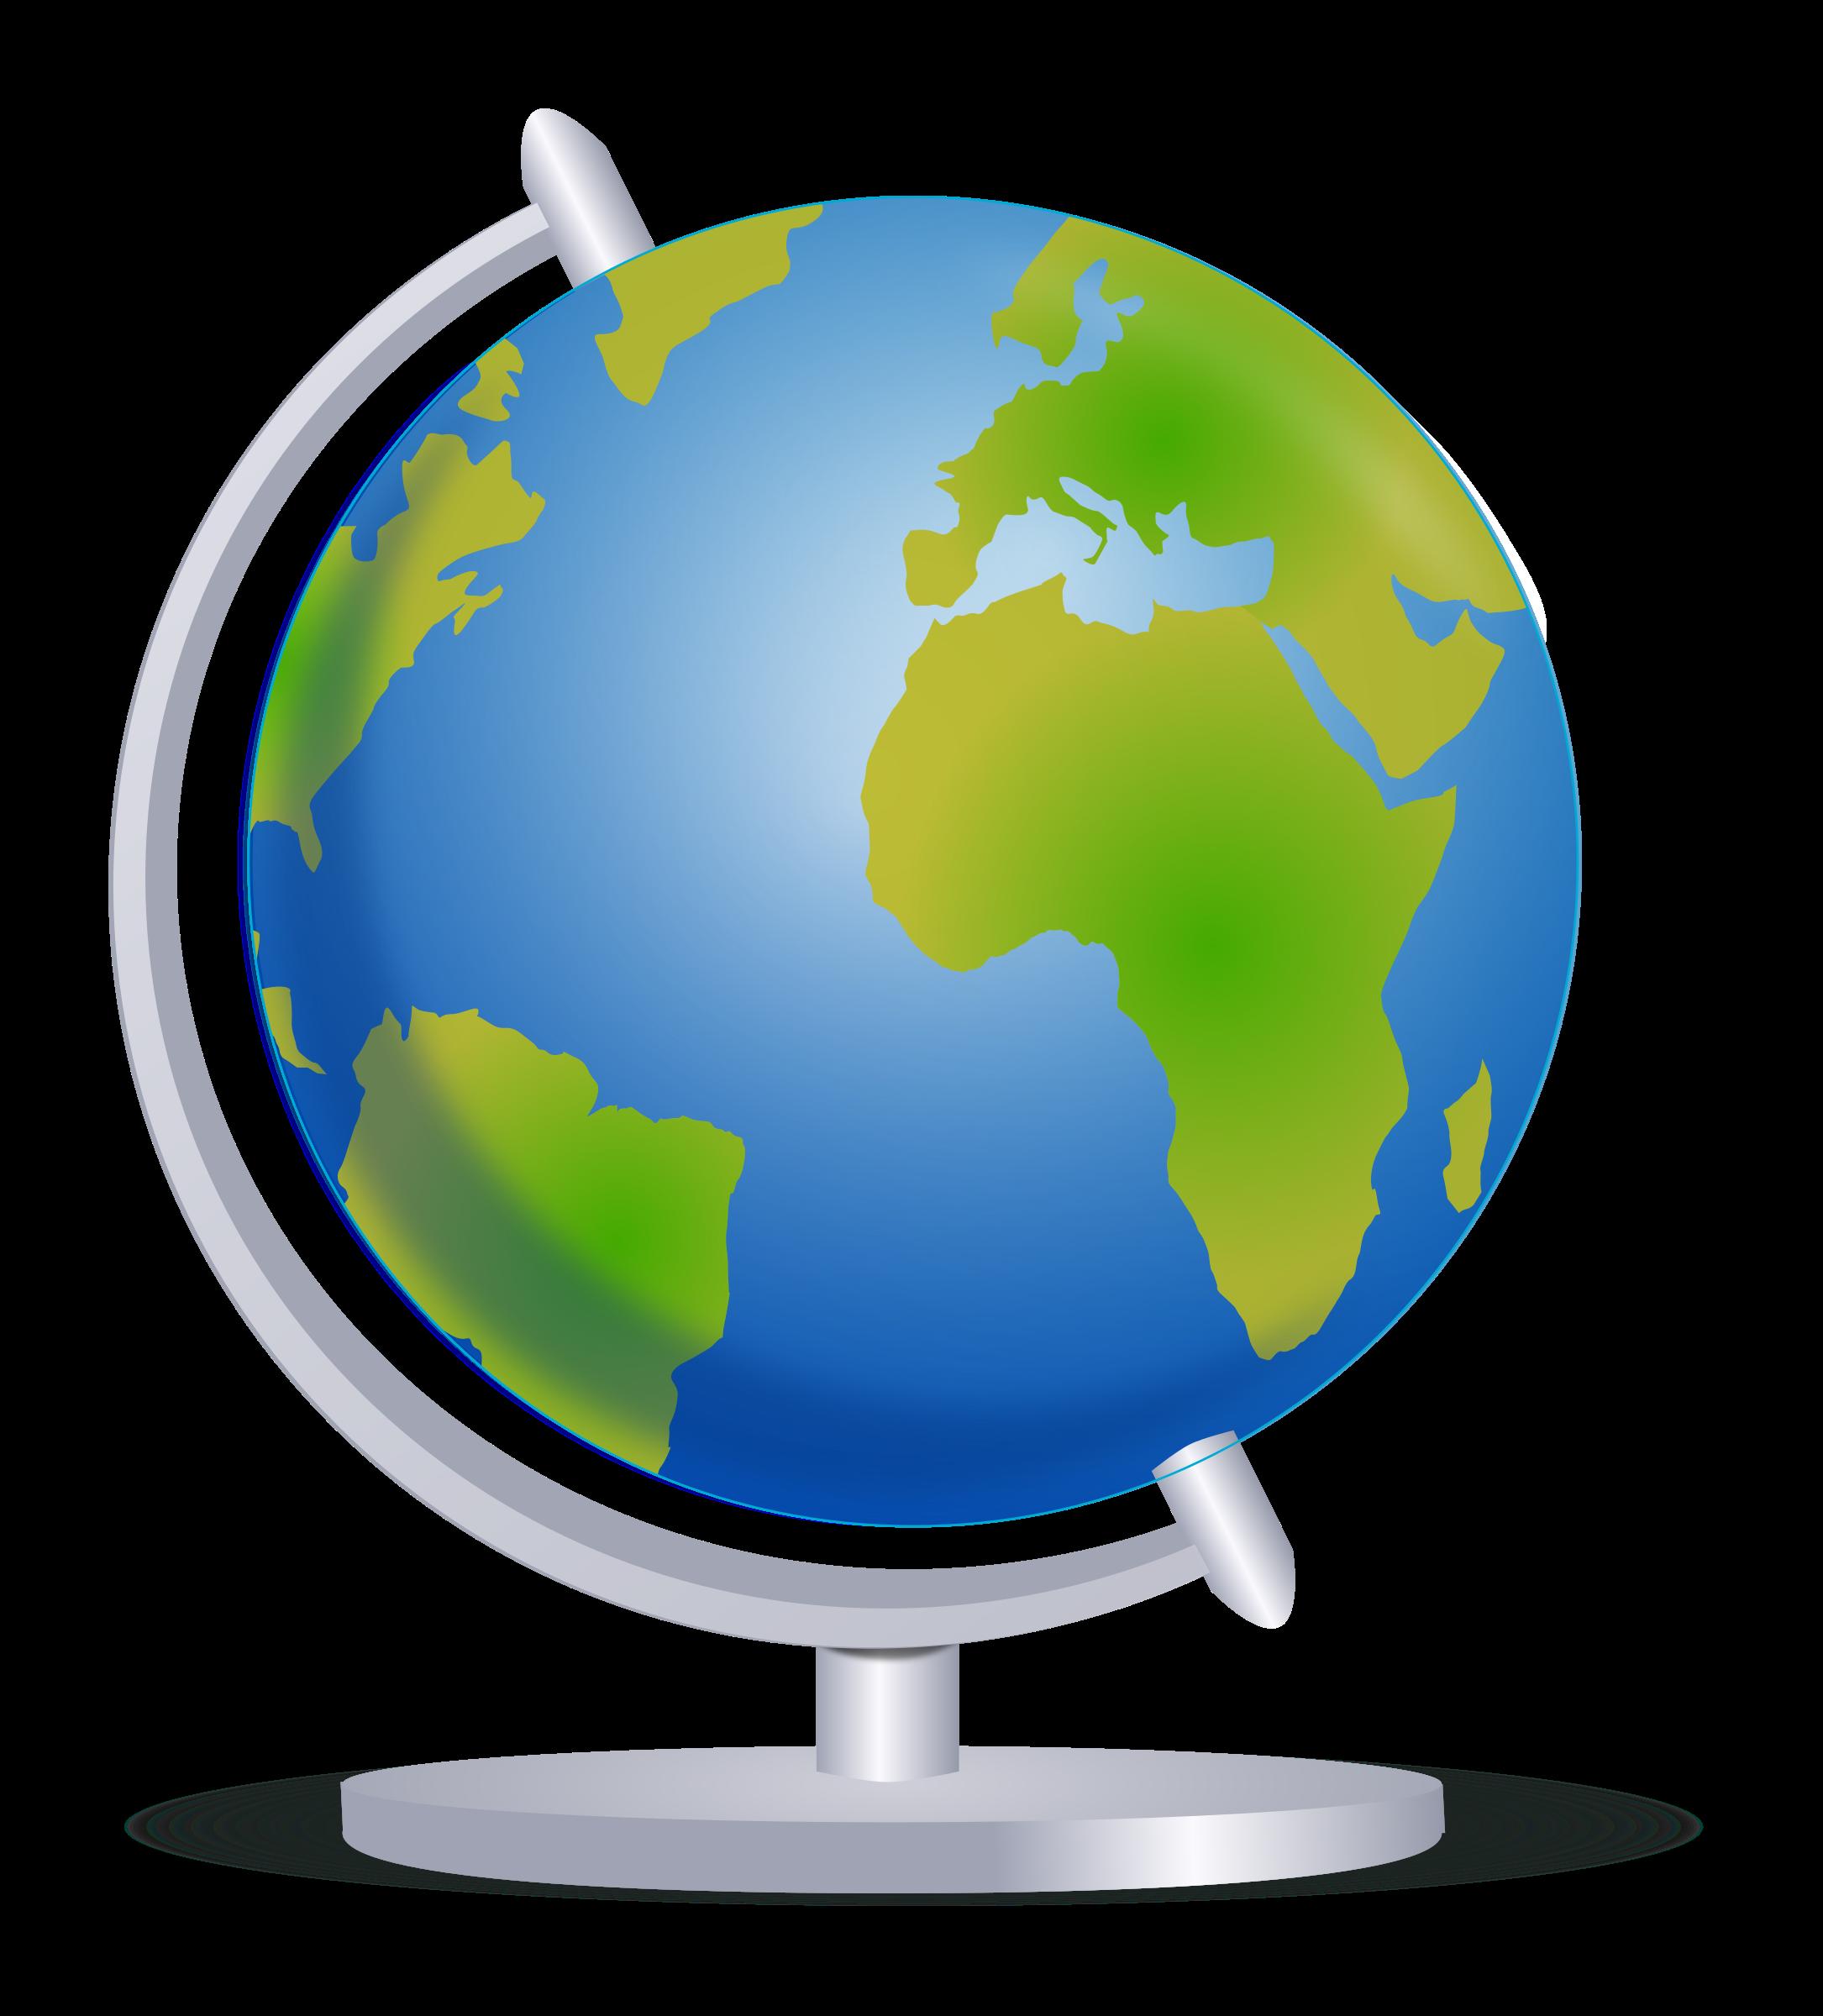 Globe on stand big. History clipart globes